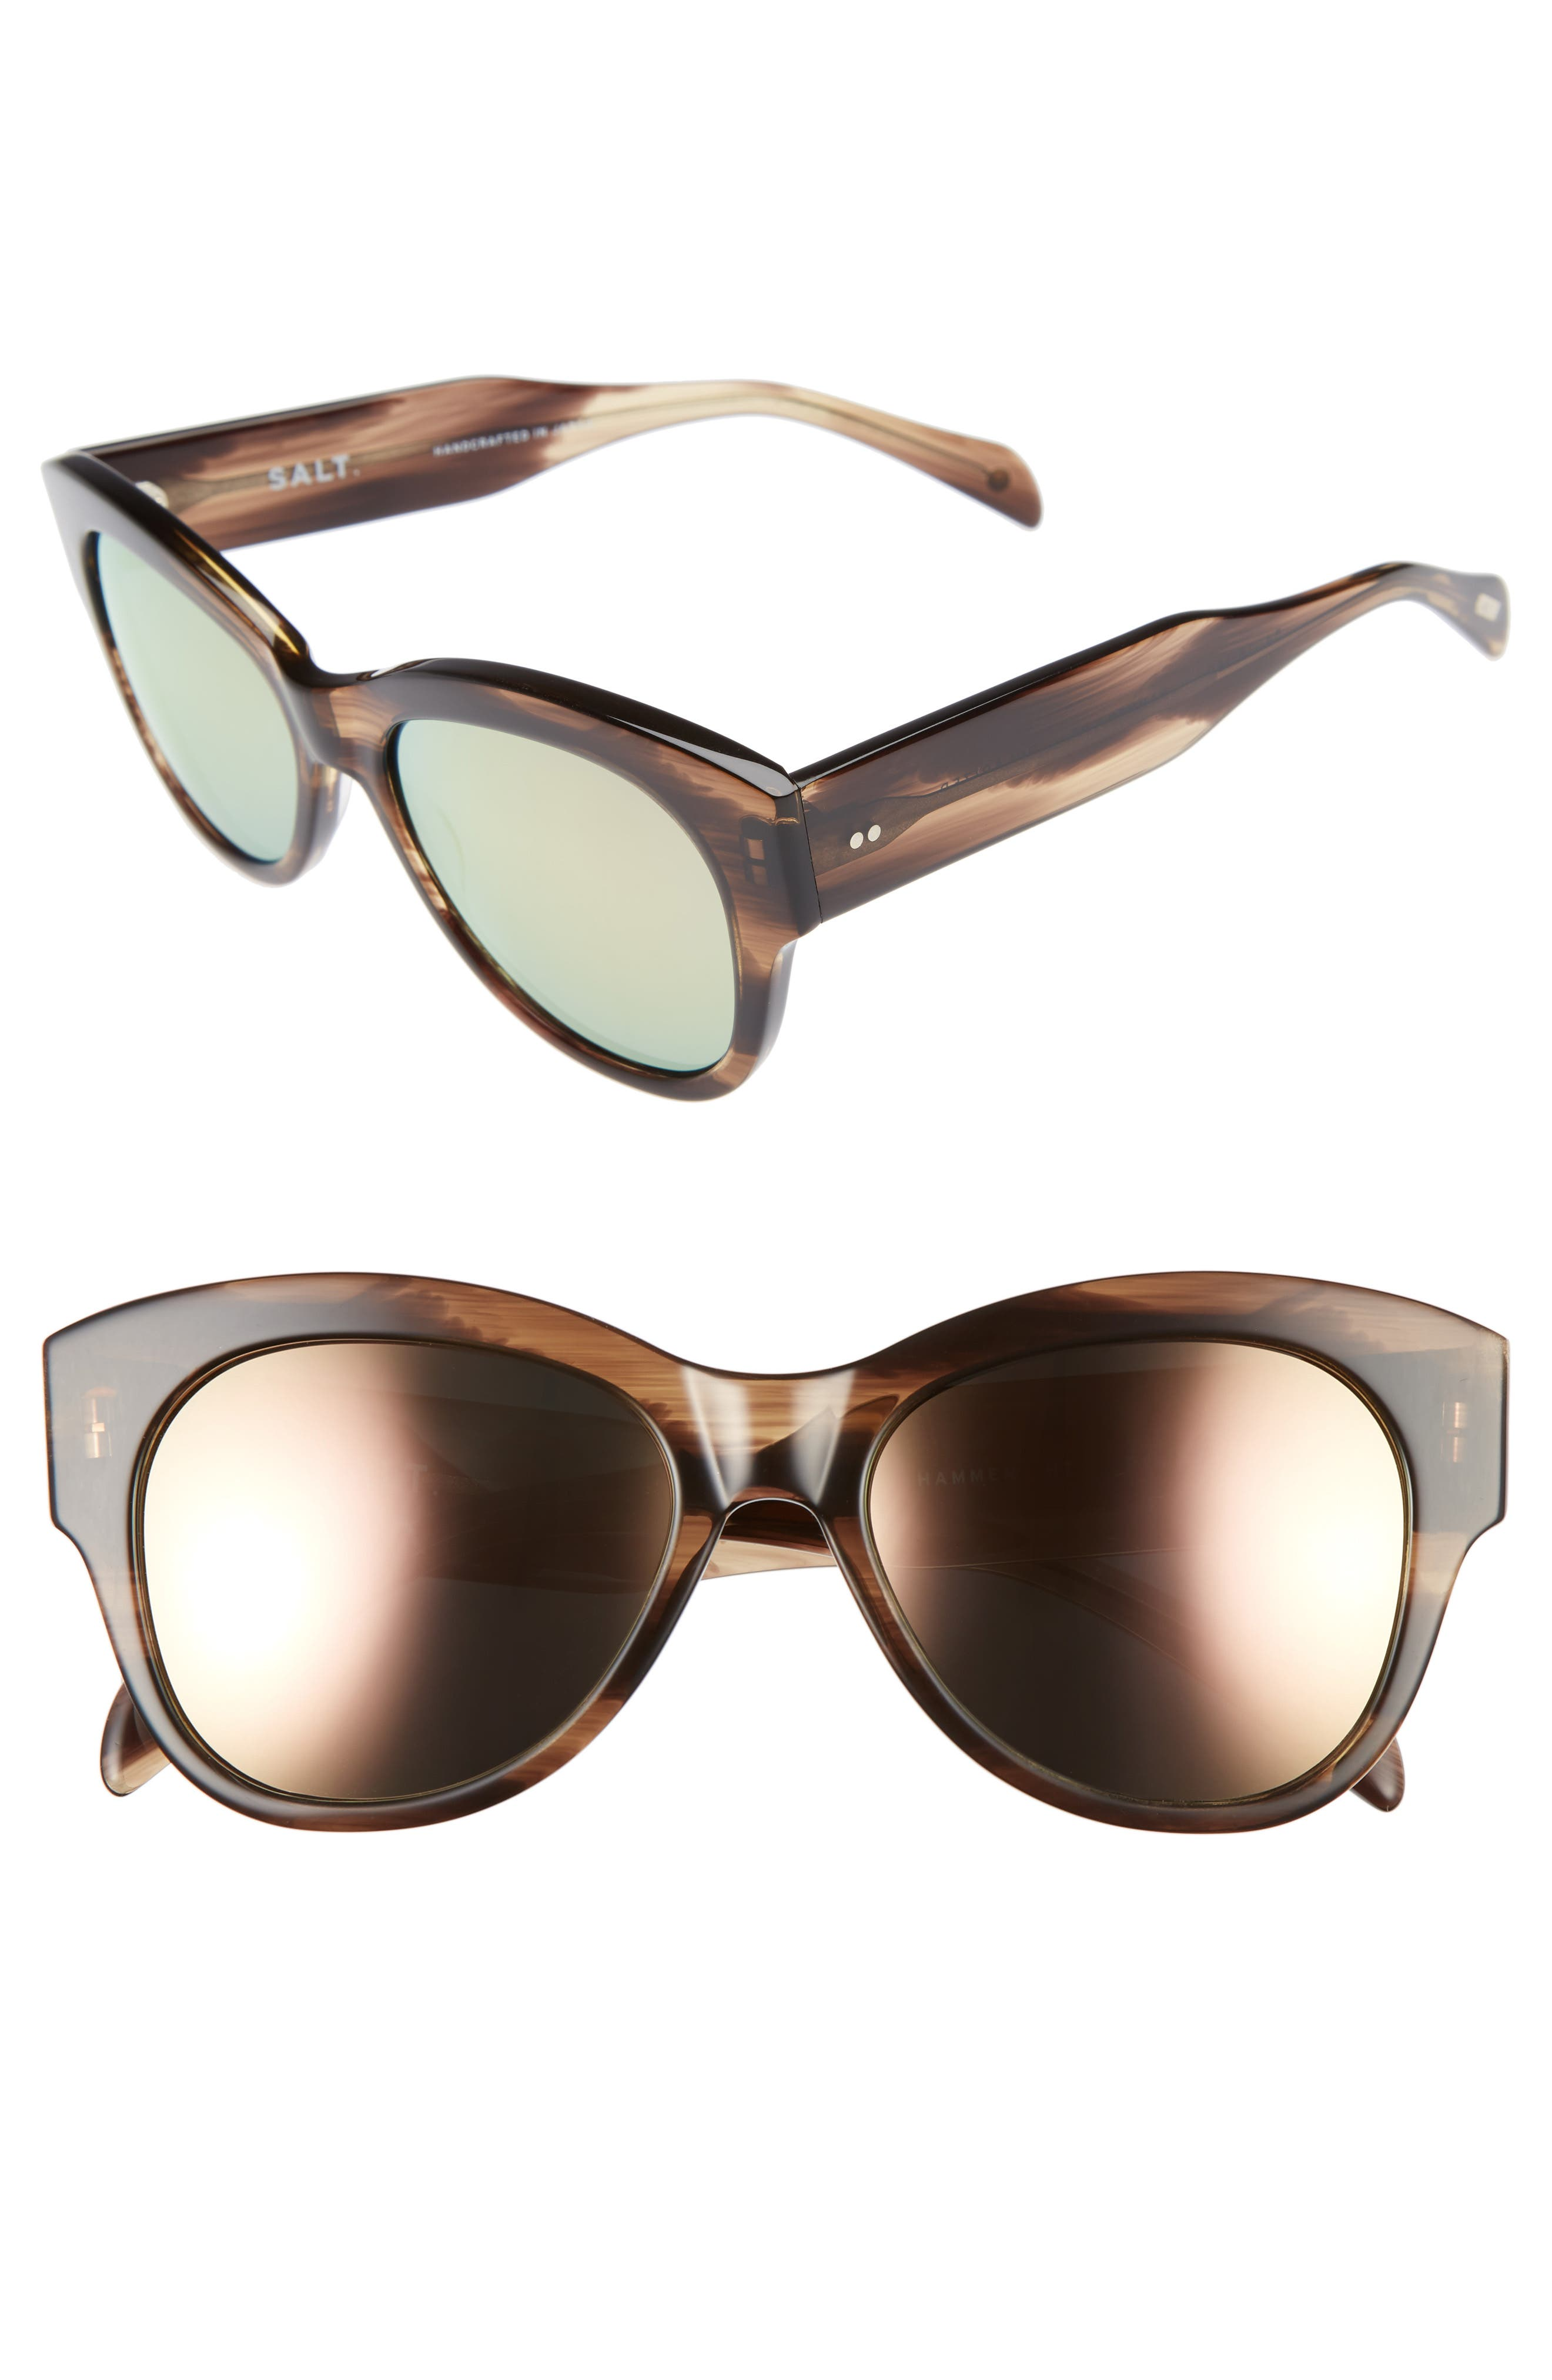 Hammen 54mm Polarized Cat Eye Sunglasses,                         Main,                         color, Hazy Taupe/ Rose Mirror